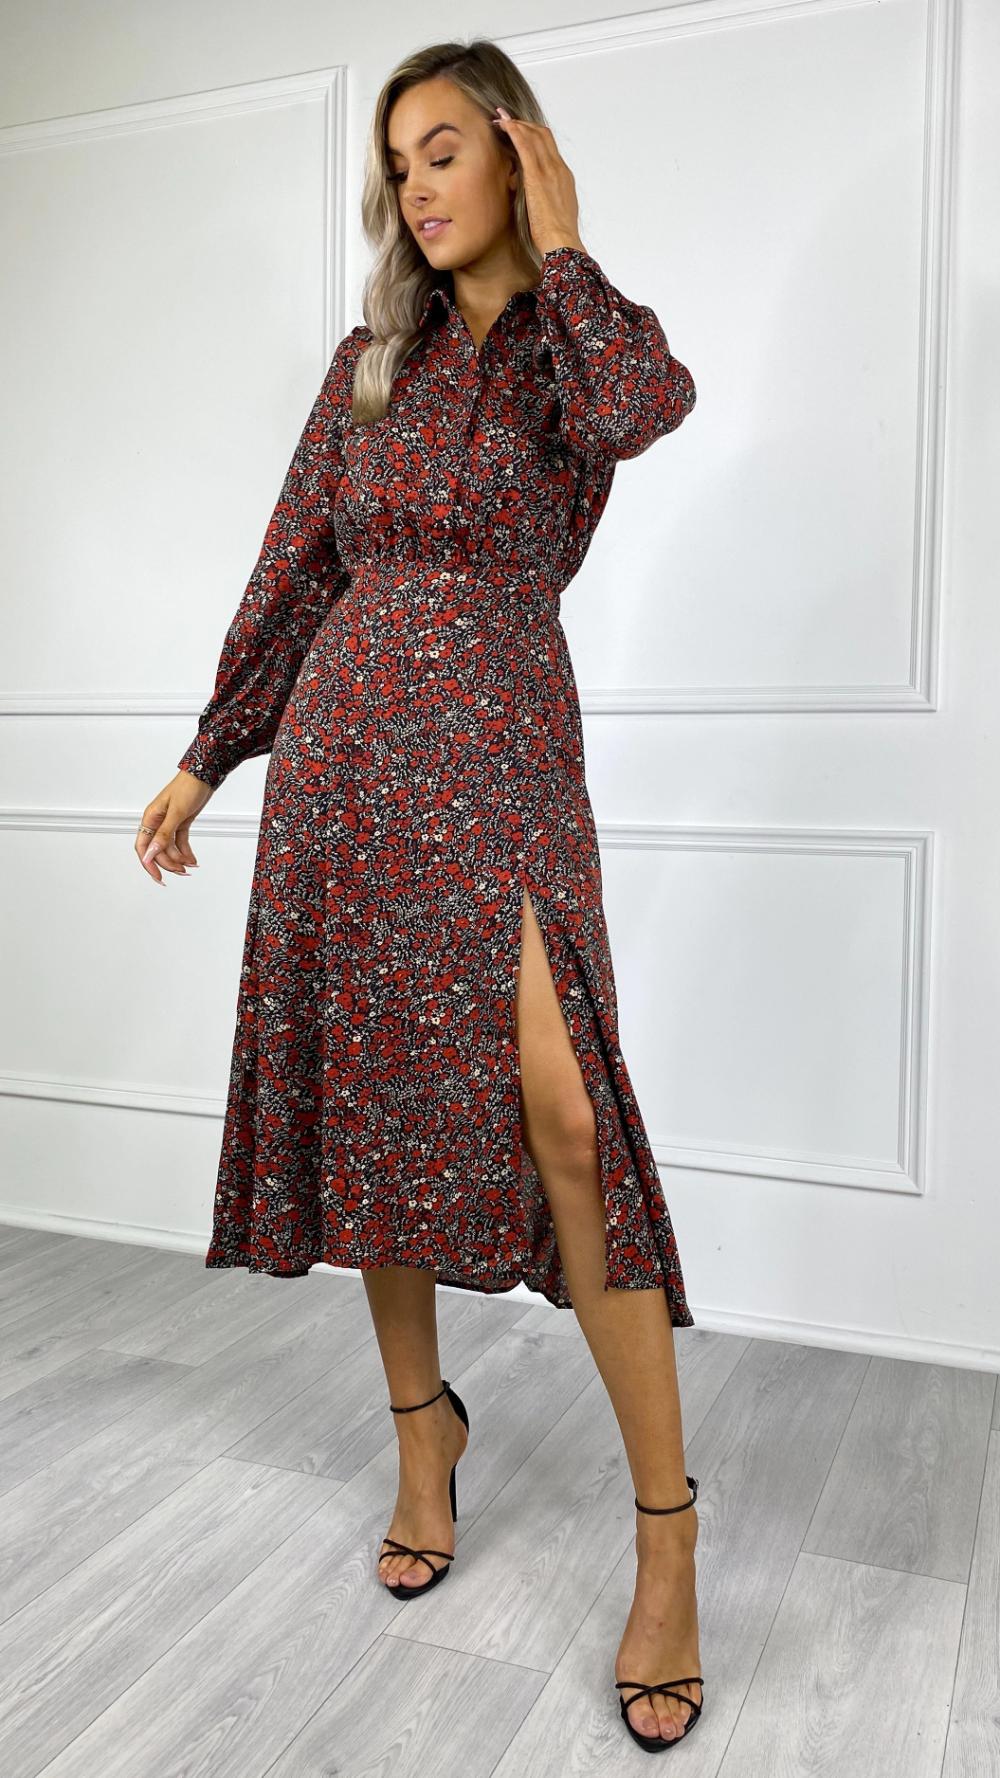 Ingrid Red Printed Button Up Midi Dress Dresses Midi Dress Print Buttons [ 1778 x 1000 Pixel ]